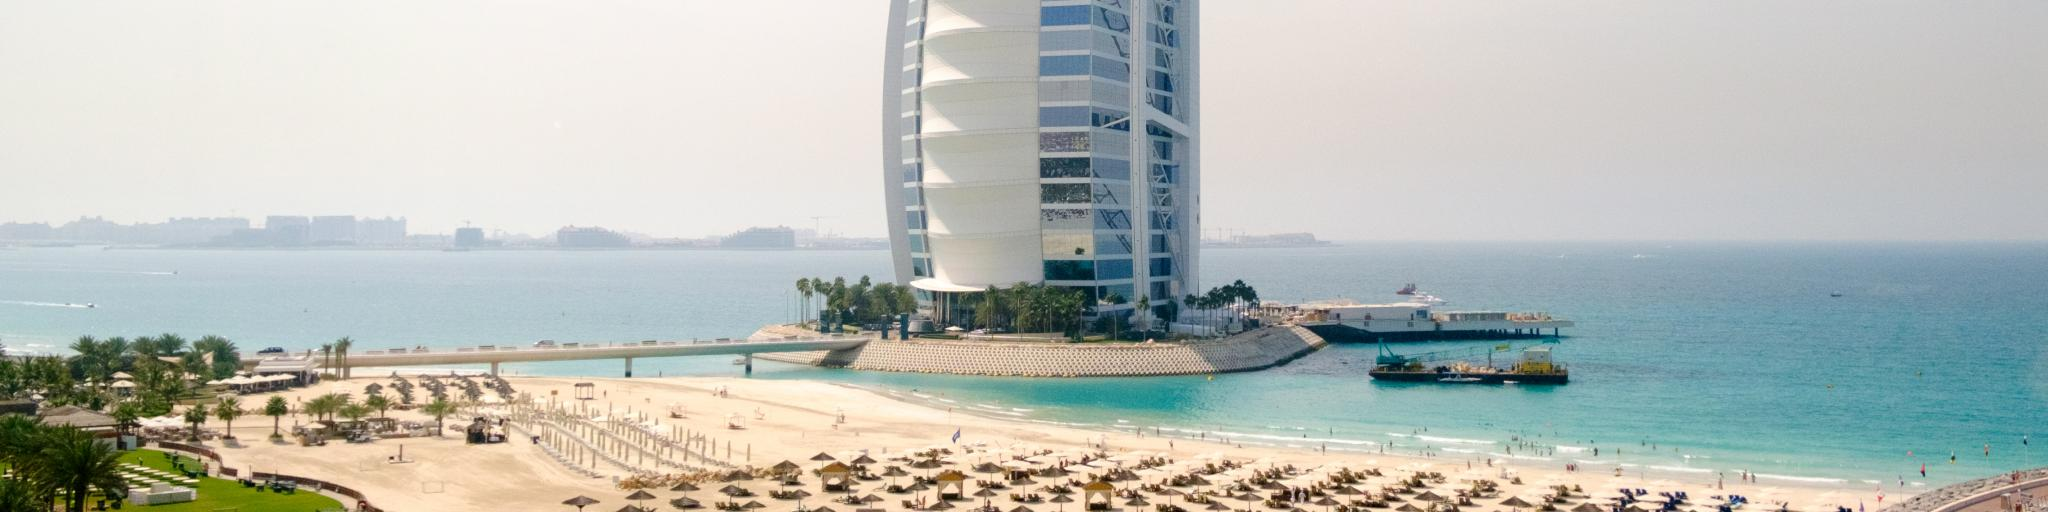 The iconic Burj Al Arab building dominates the shoreline of Dubai, UAE